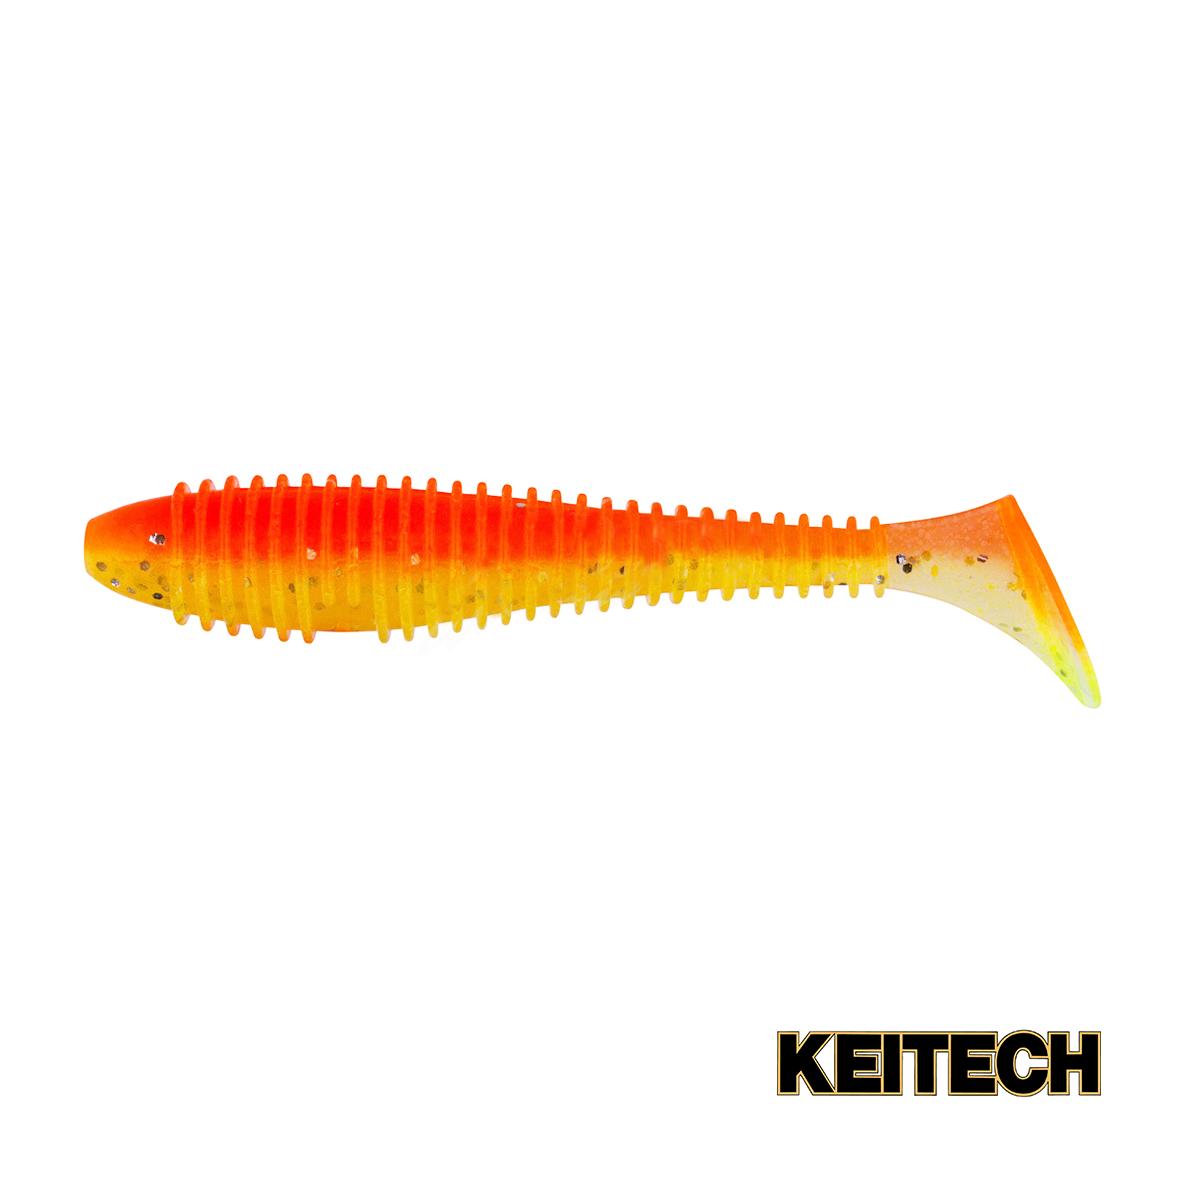 "Силикон Keitech Swing Impact FAT 3.8"" (6 шт/упак) ц:pal#04 sun sh"